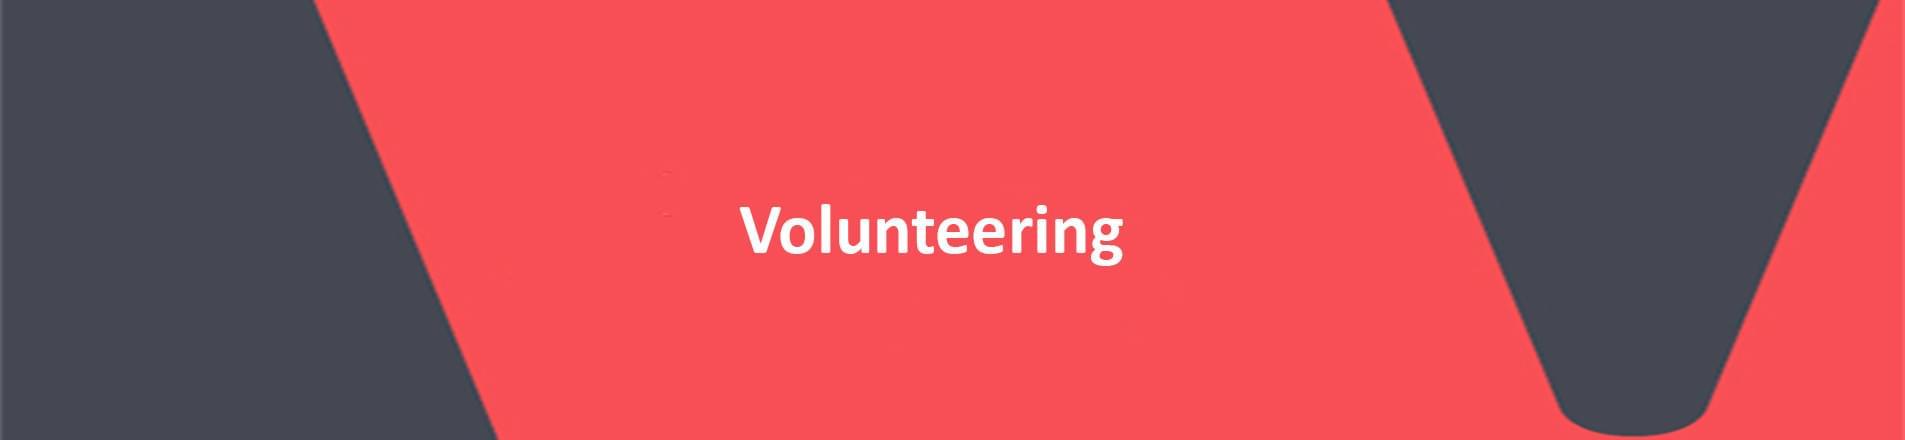 The word volunteering on red VERCIDA branded background